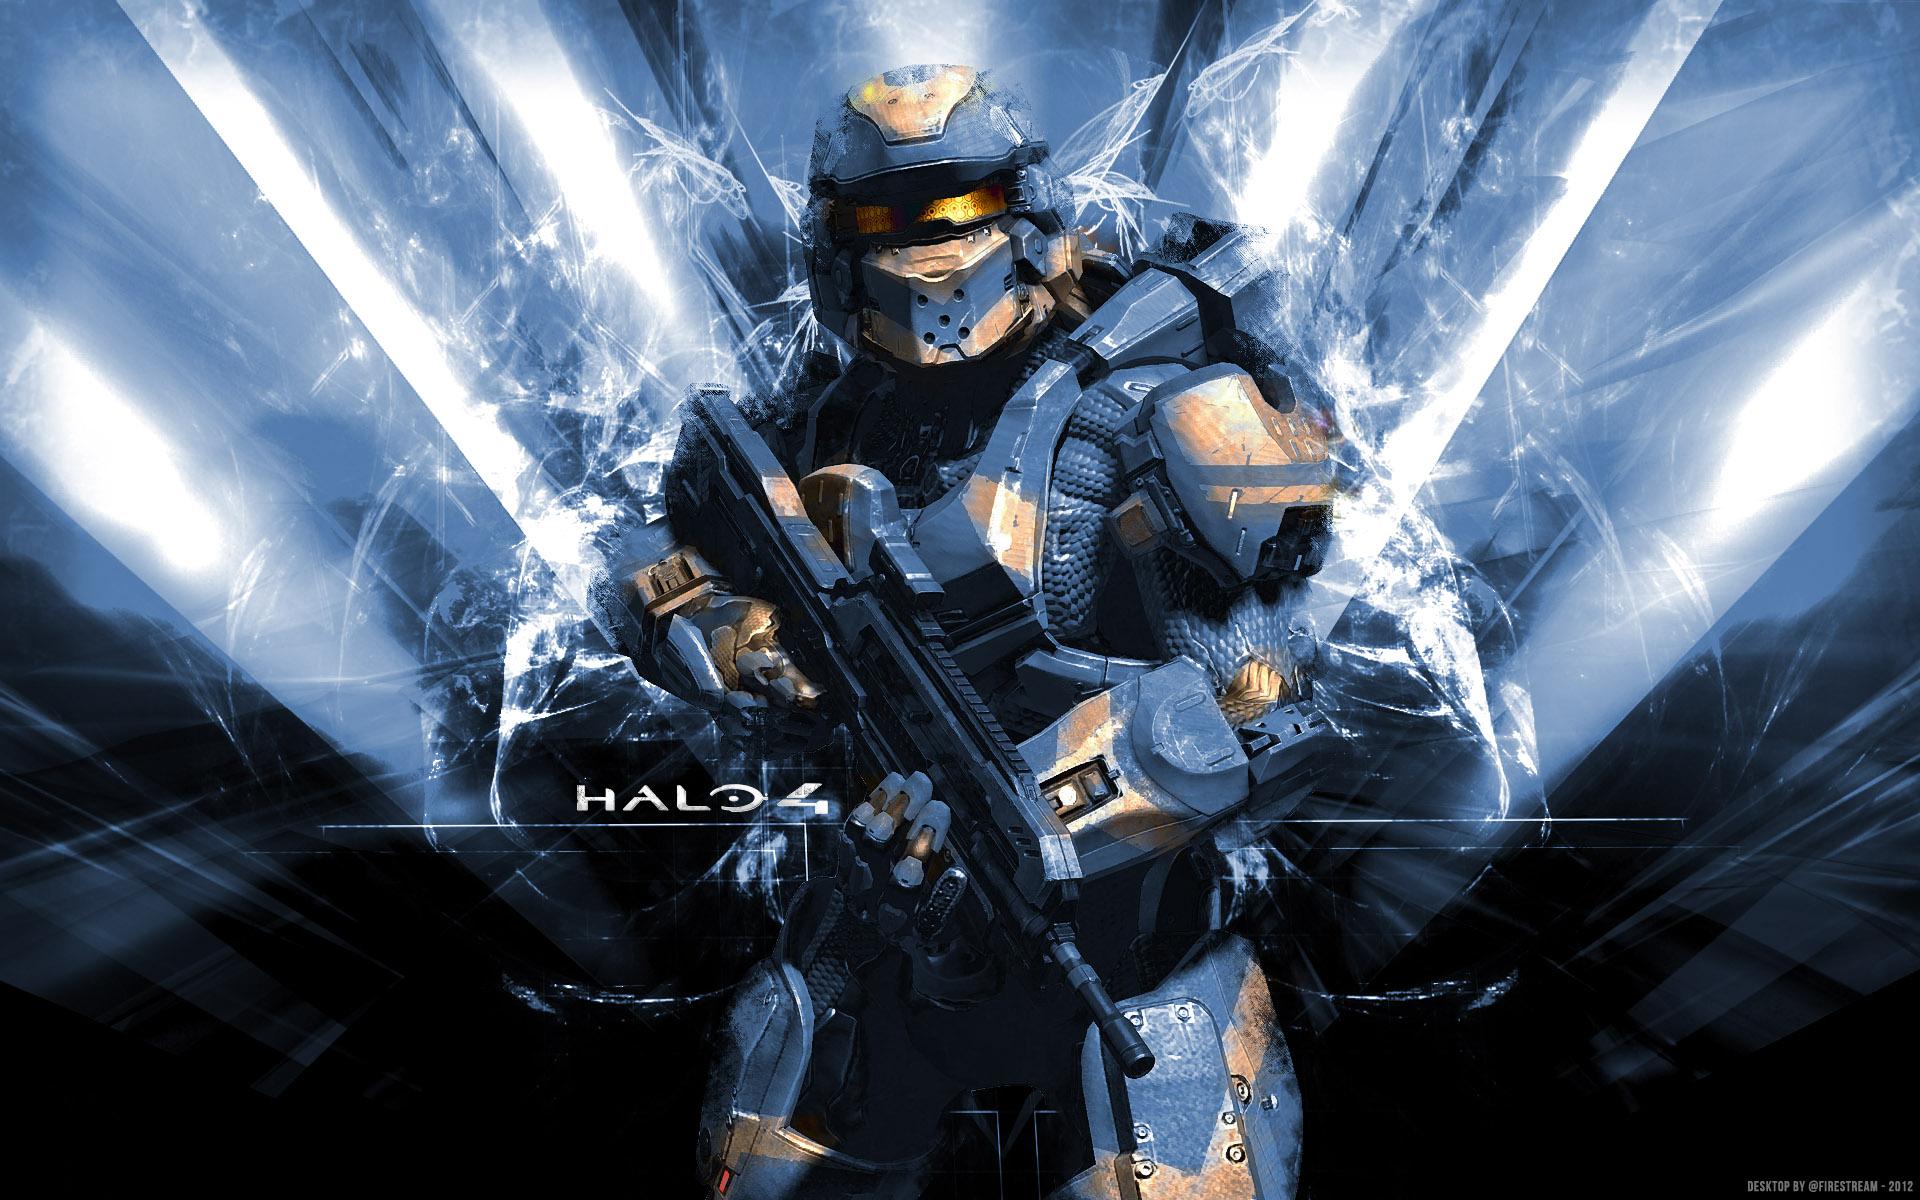 Halo 4 HD Wallpaper Wallpupcom 1920x1200